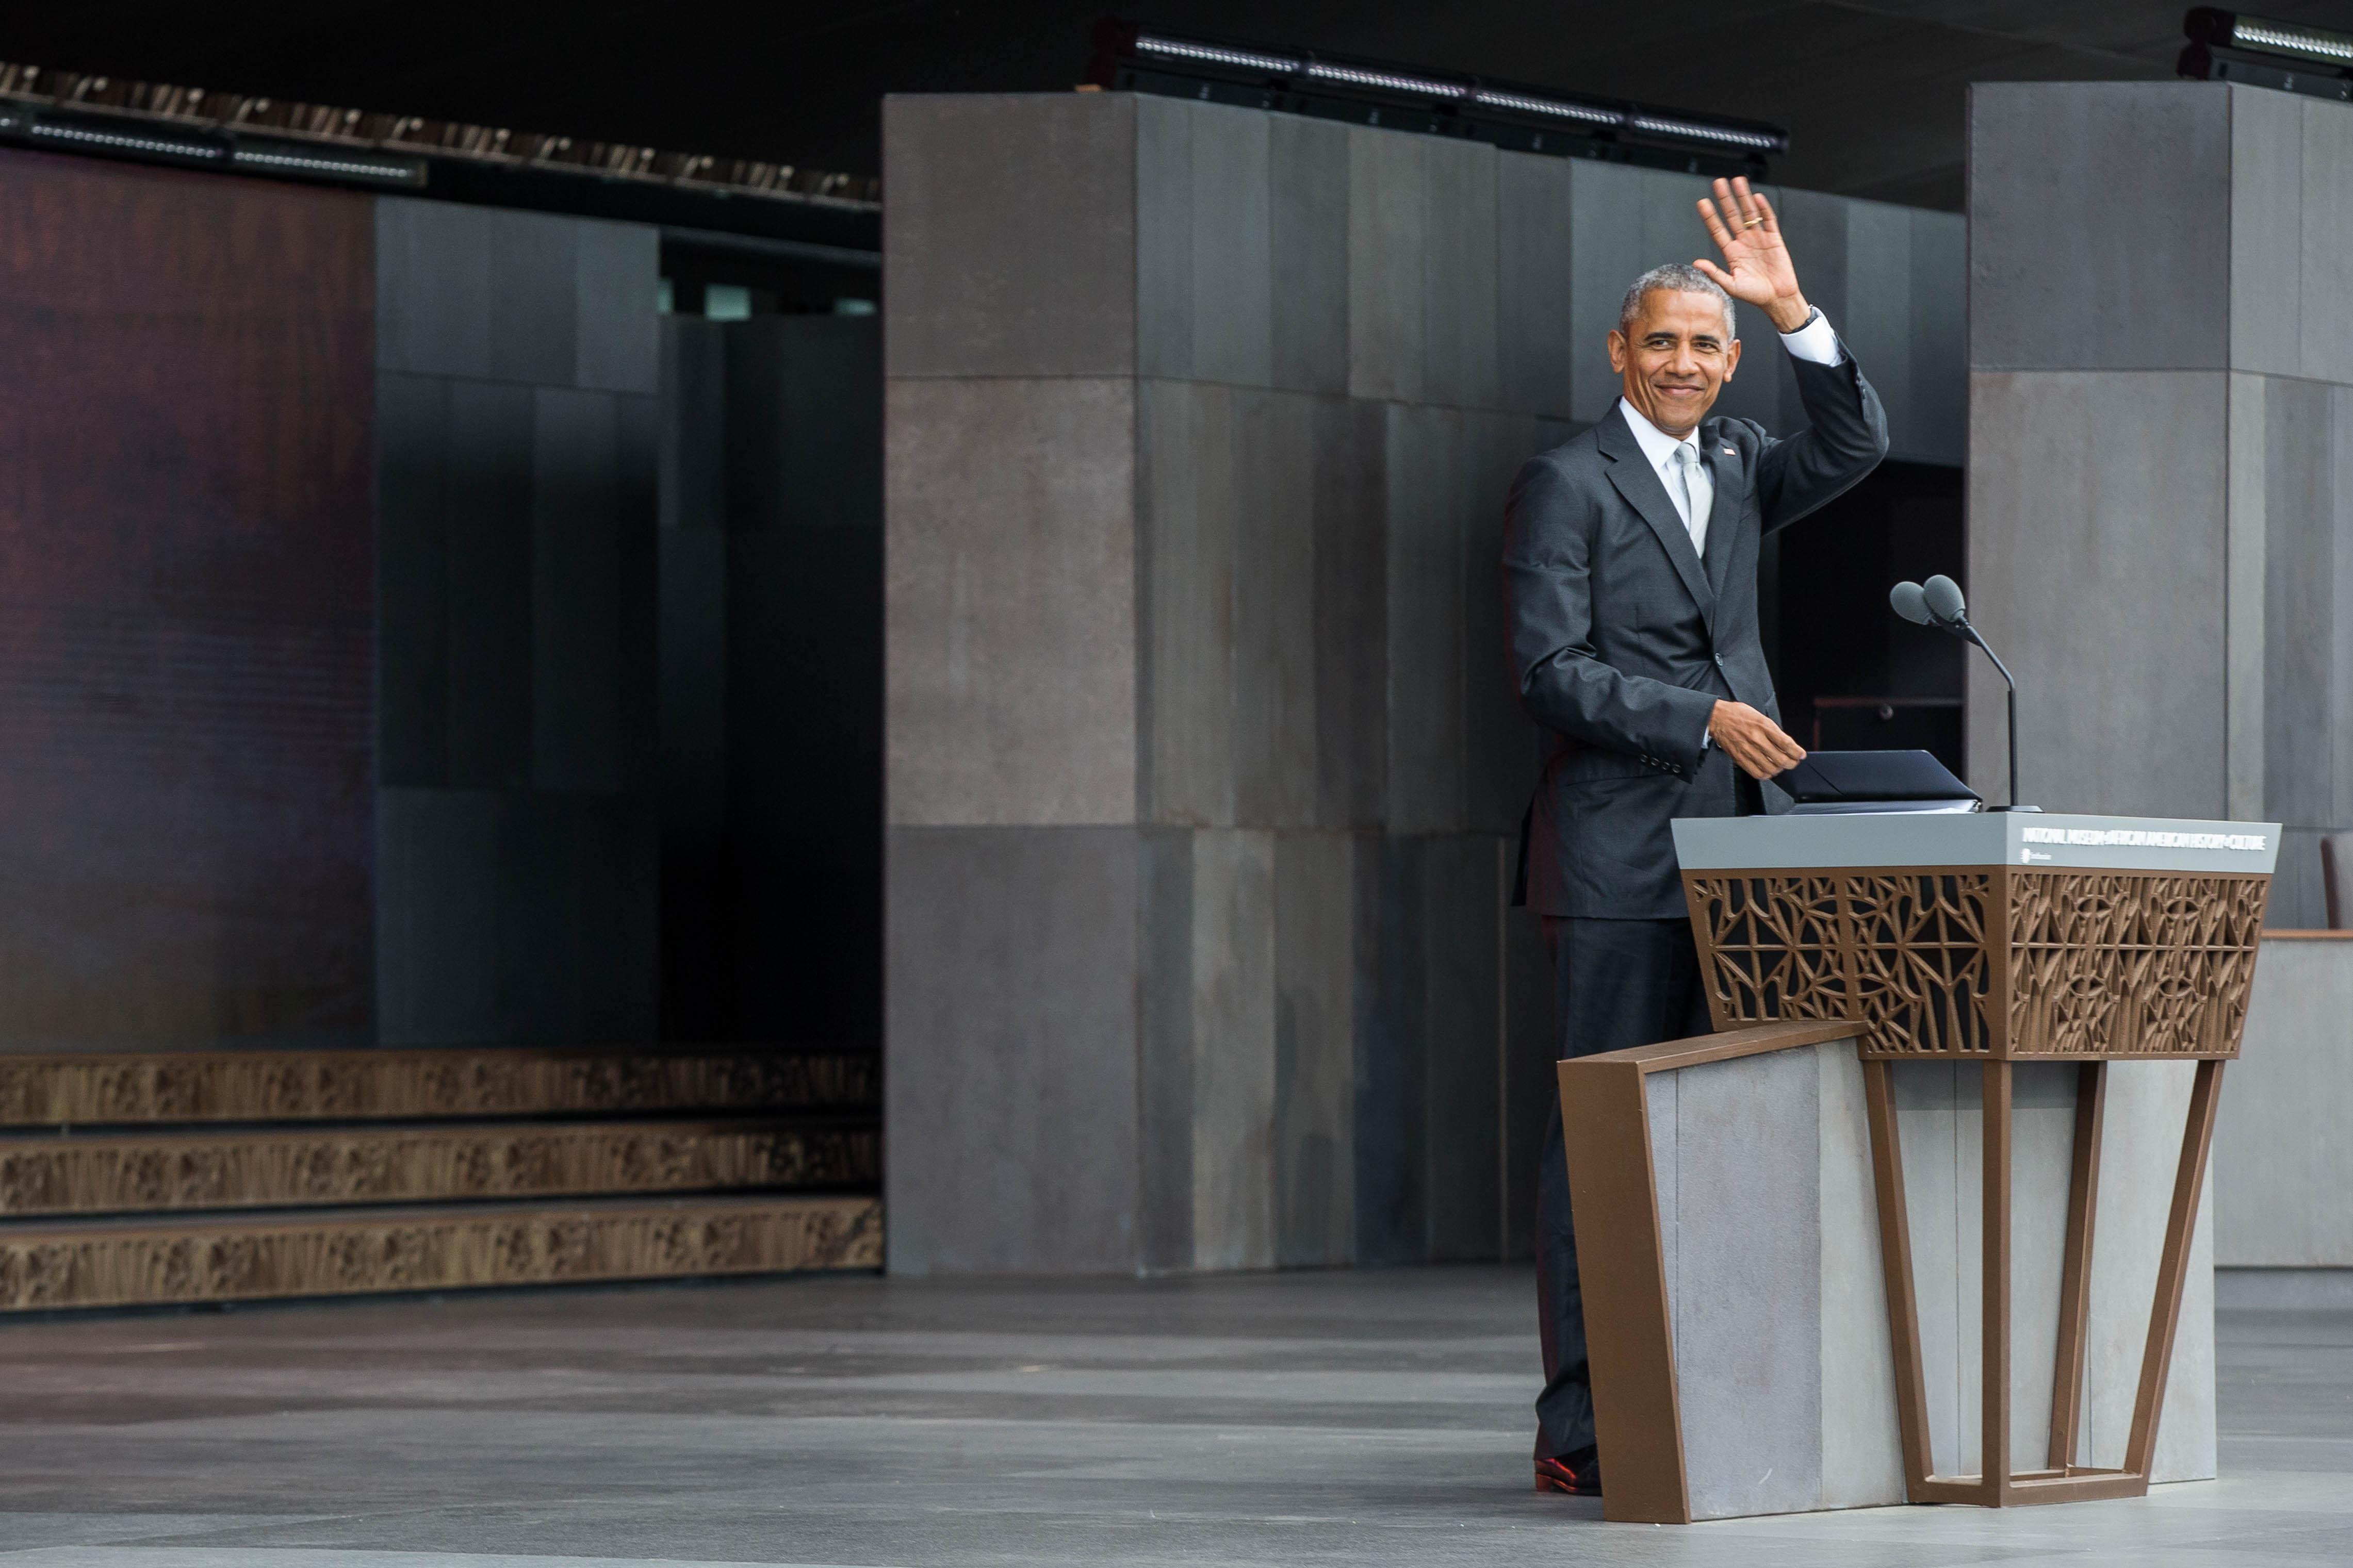 US-MUSEUM-AFRICANAMERICAM-CULTURE-HISTORY